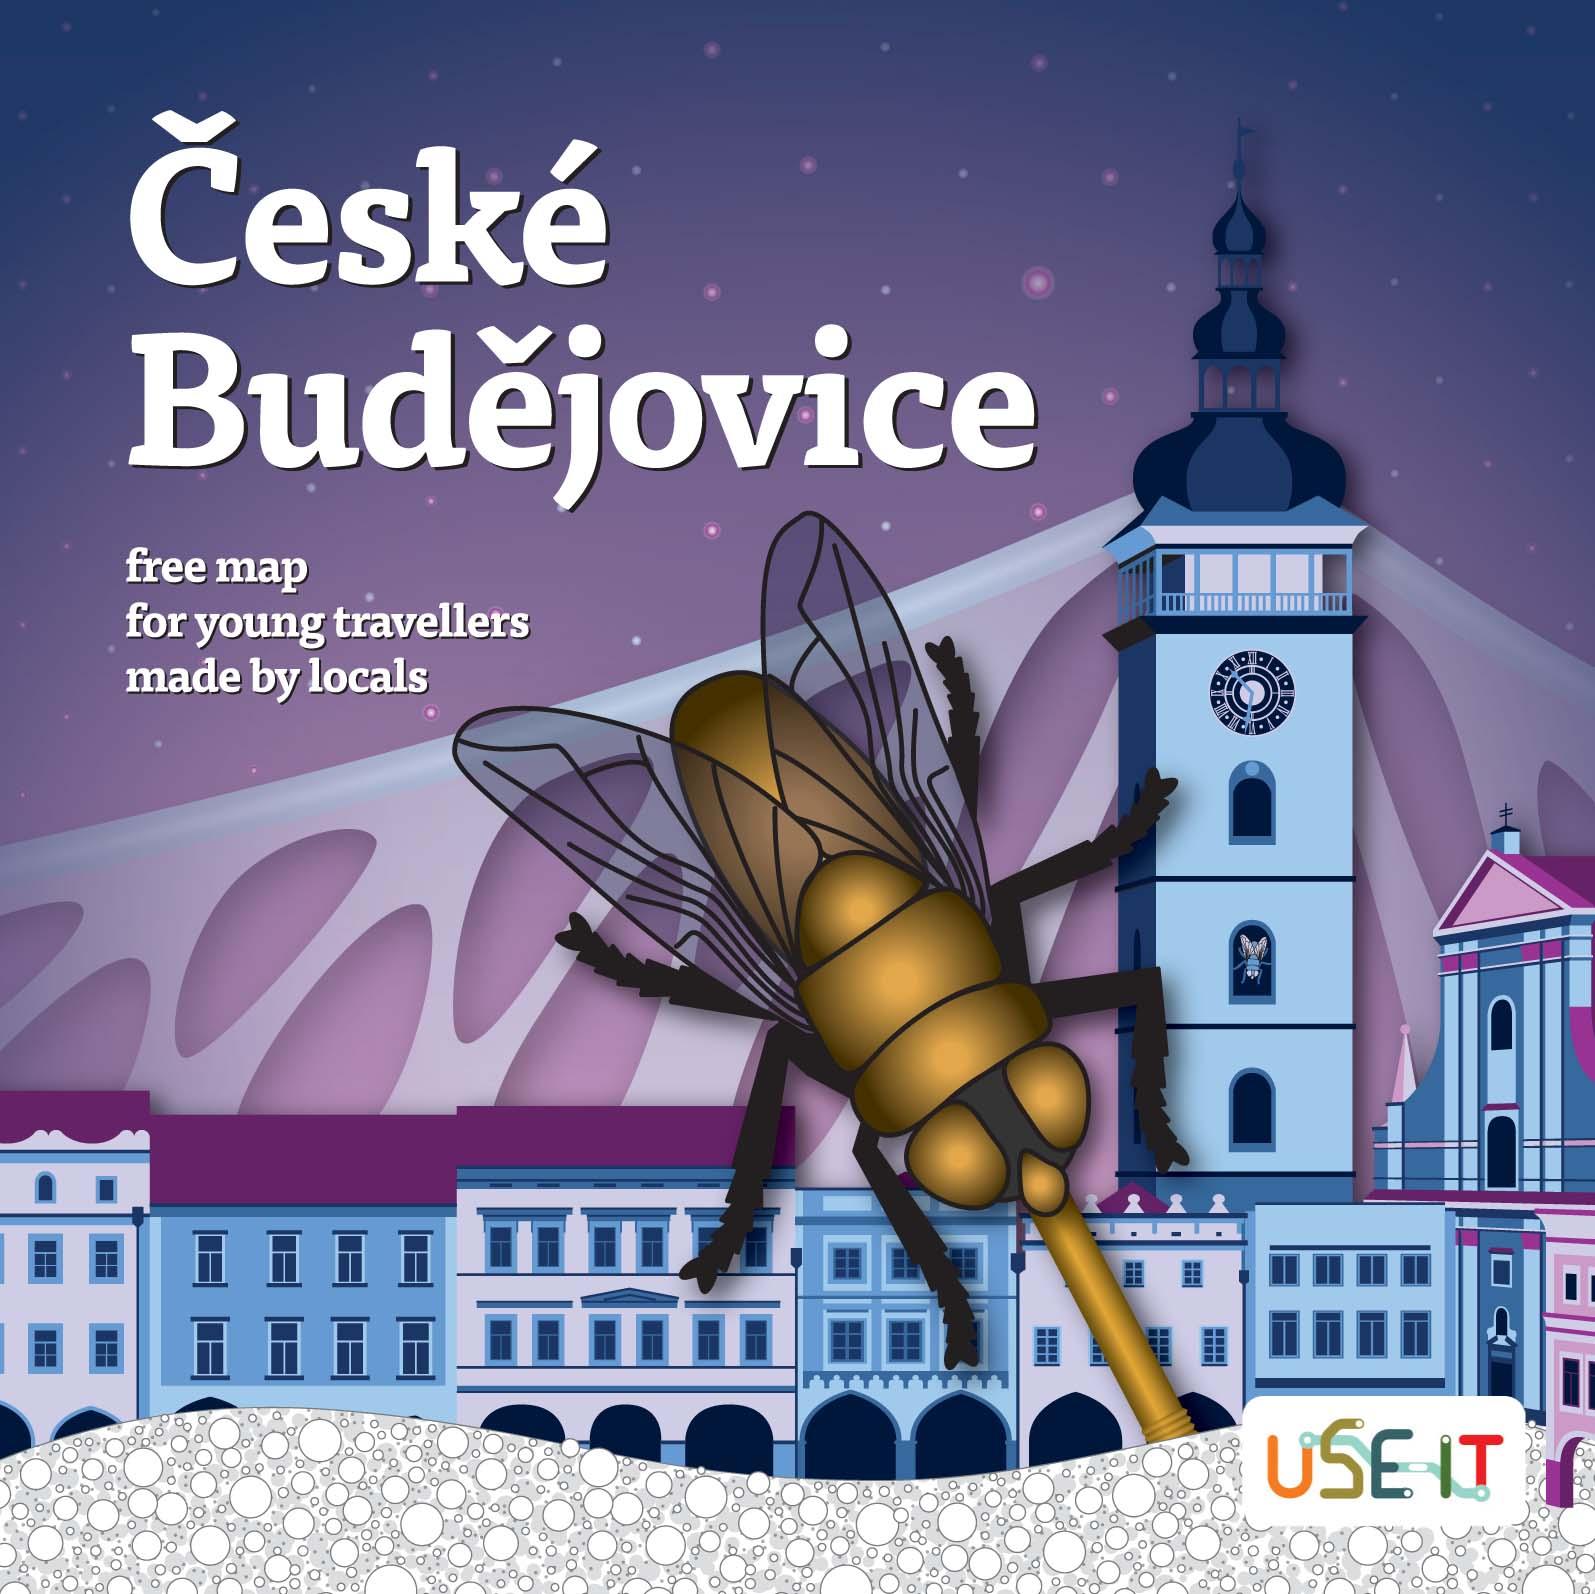 Č. Budějovice & Č. Krumlov 2017